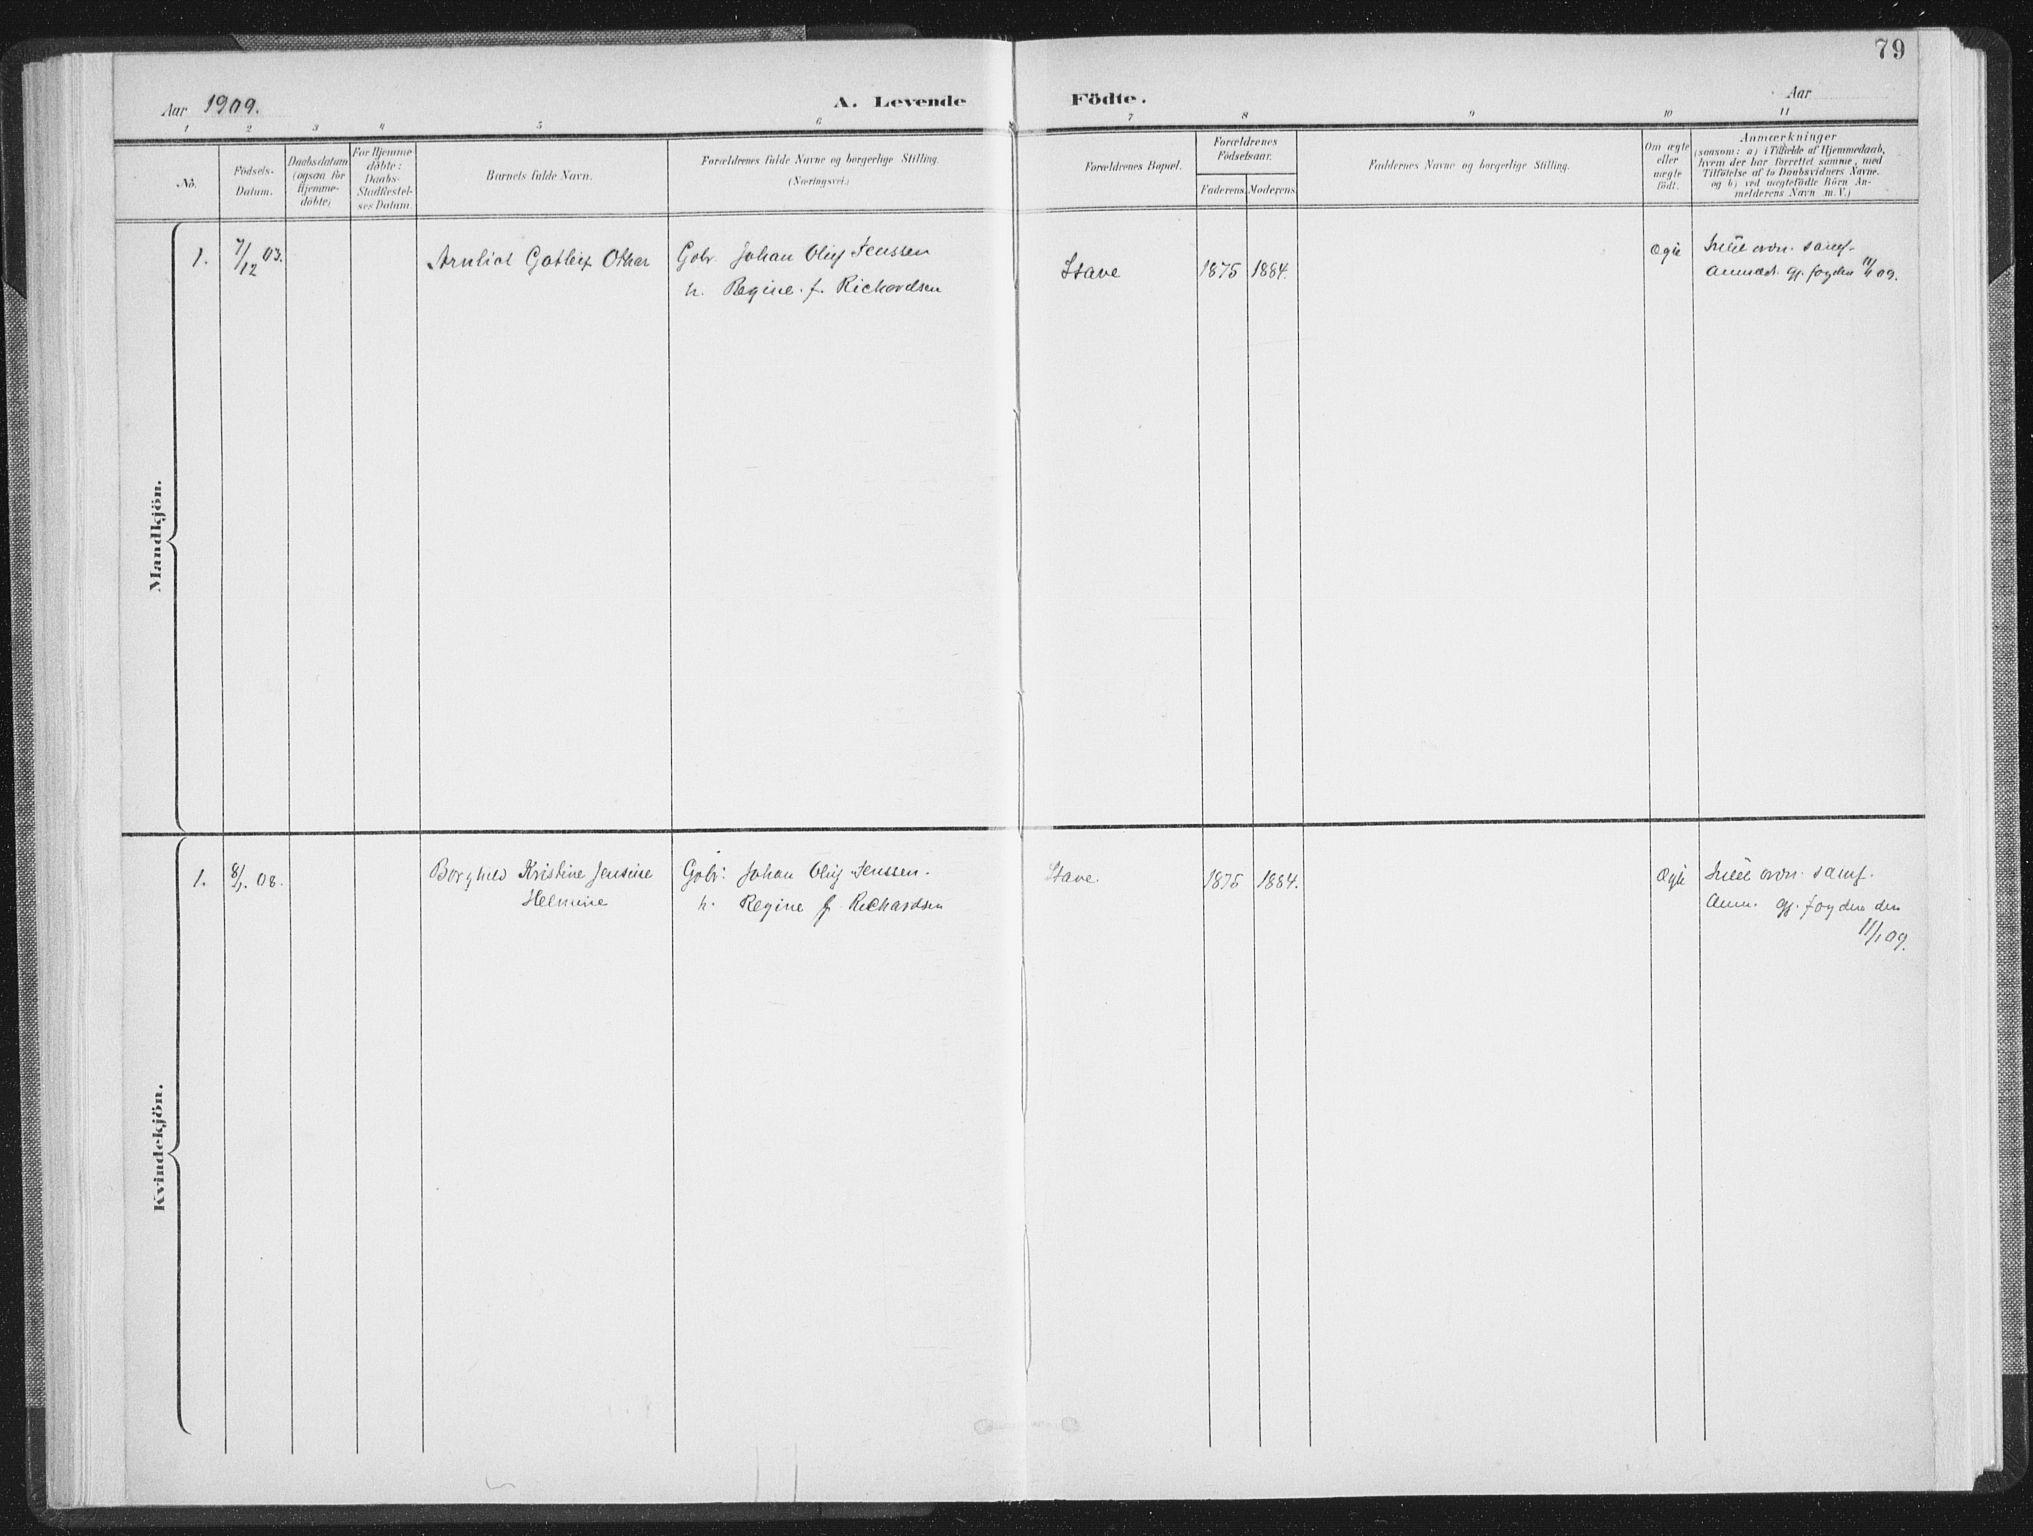 SAT, Ministerialprotokoller, klokkerbøker og fødselsregistre - Nordland, 897/L1400: Ministerialbok nr. 897A07, 1897-1908, s. 79